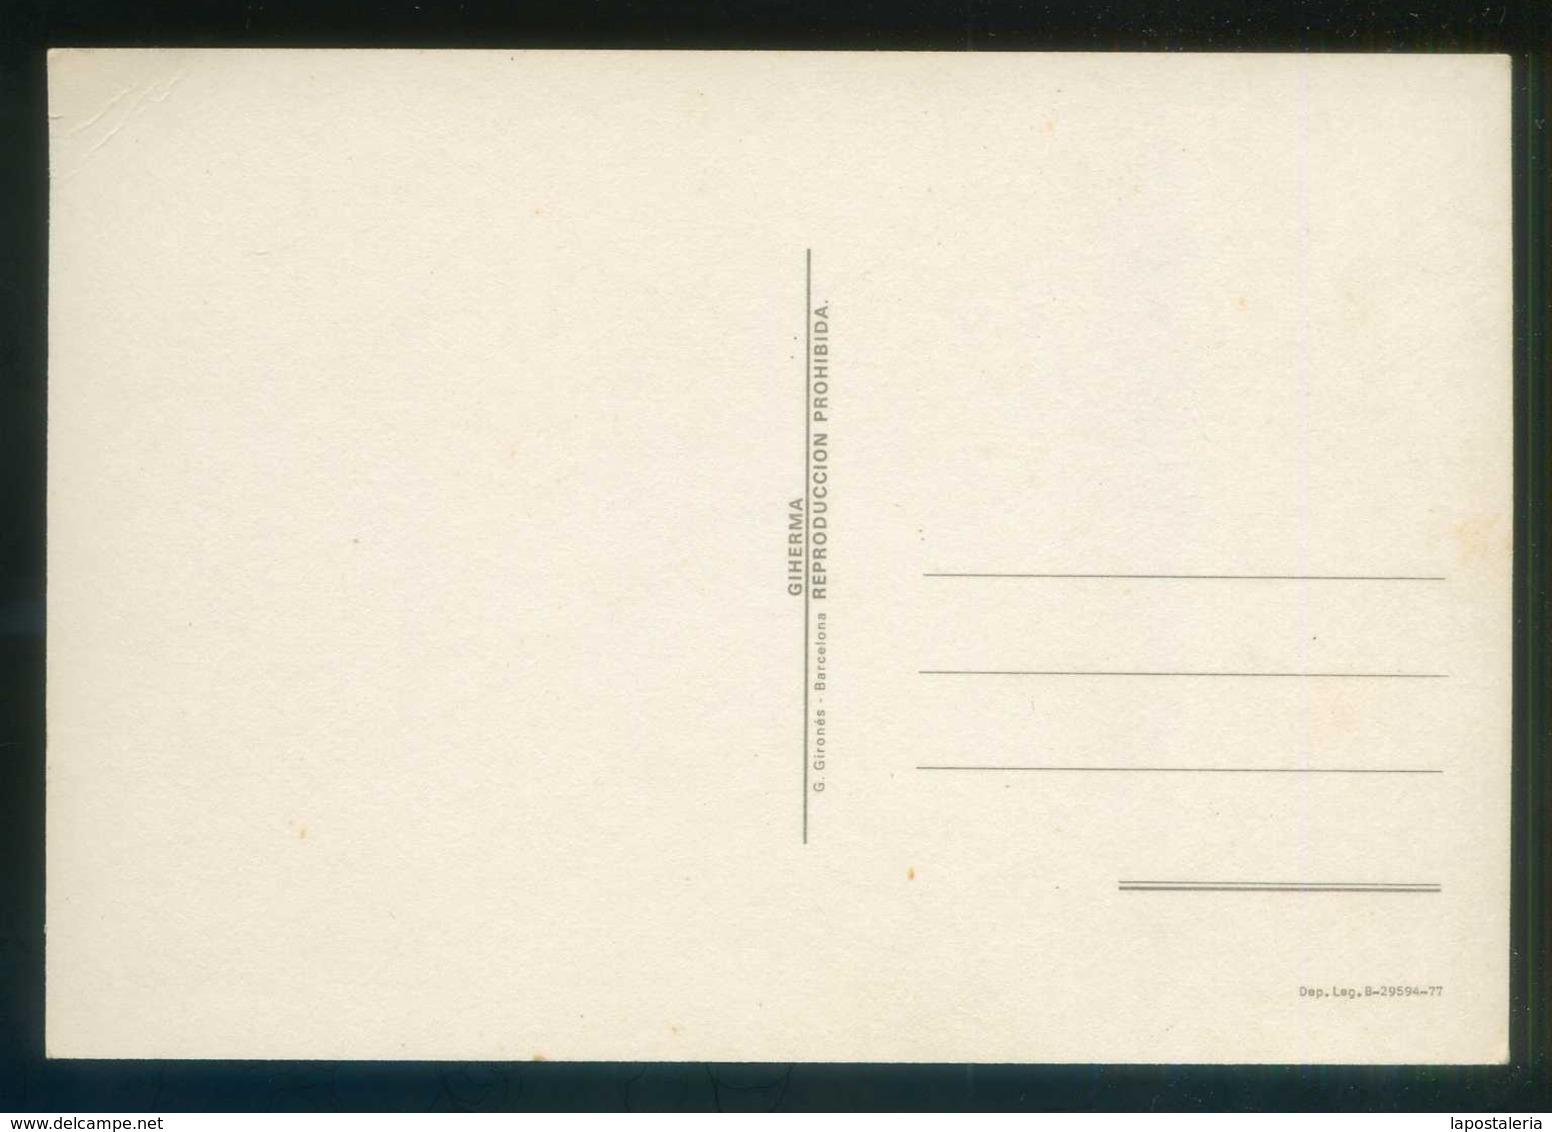 Ed. Giherma. Dep. Legal B. 29594-77. Nueva. - Flores, Plantas & Arboles